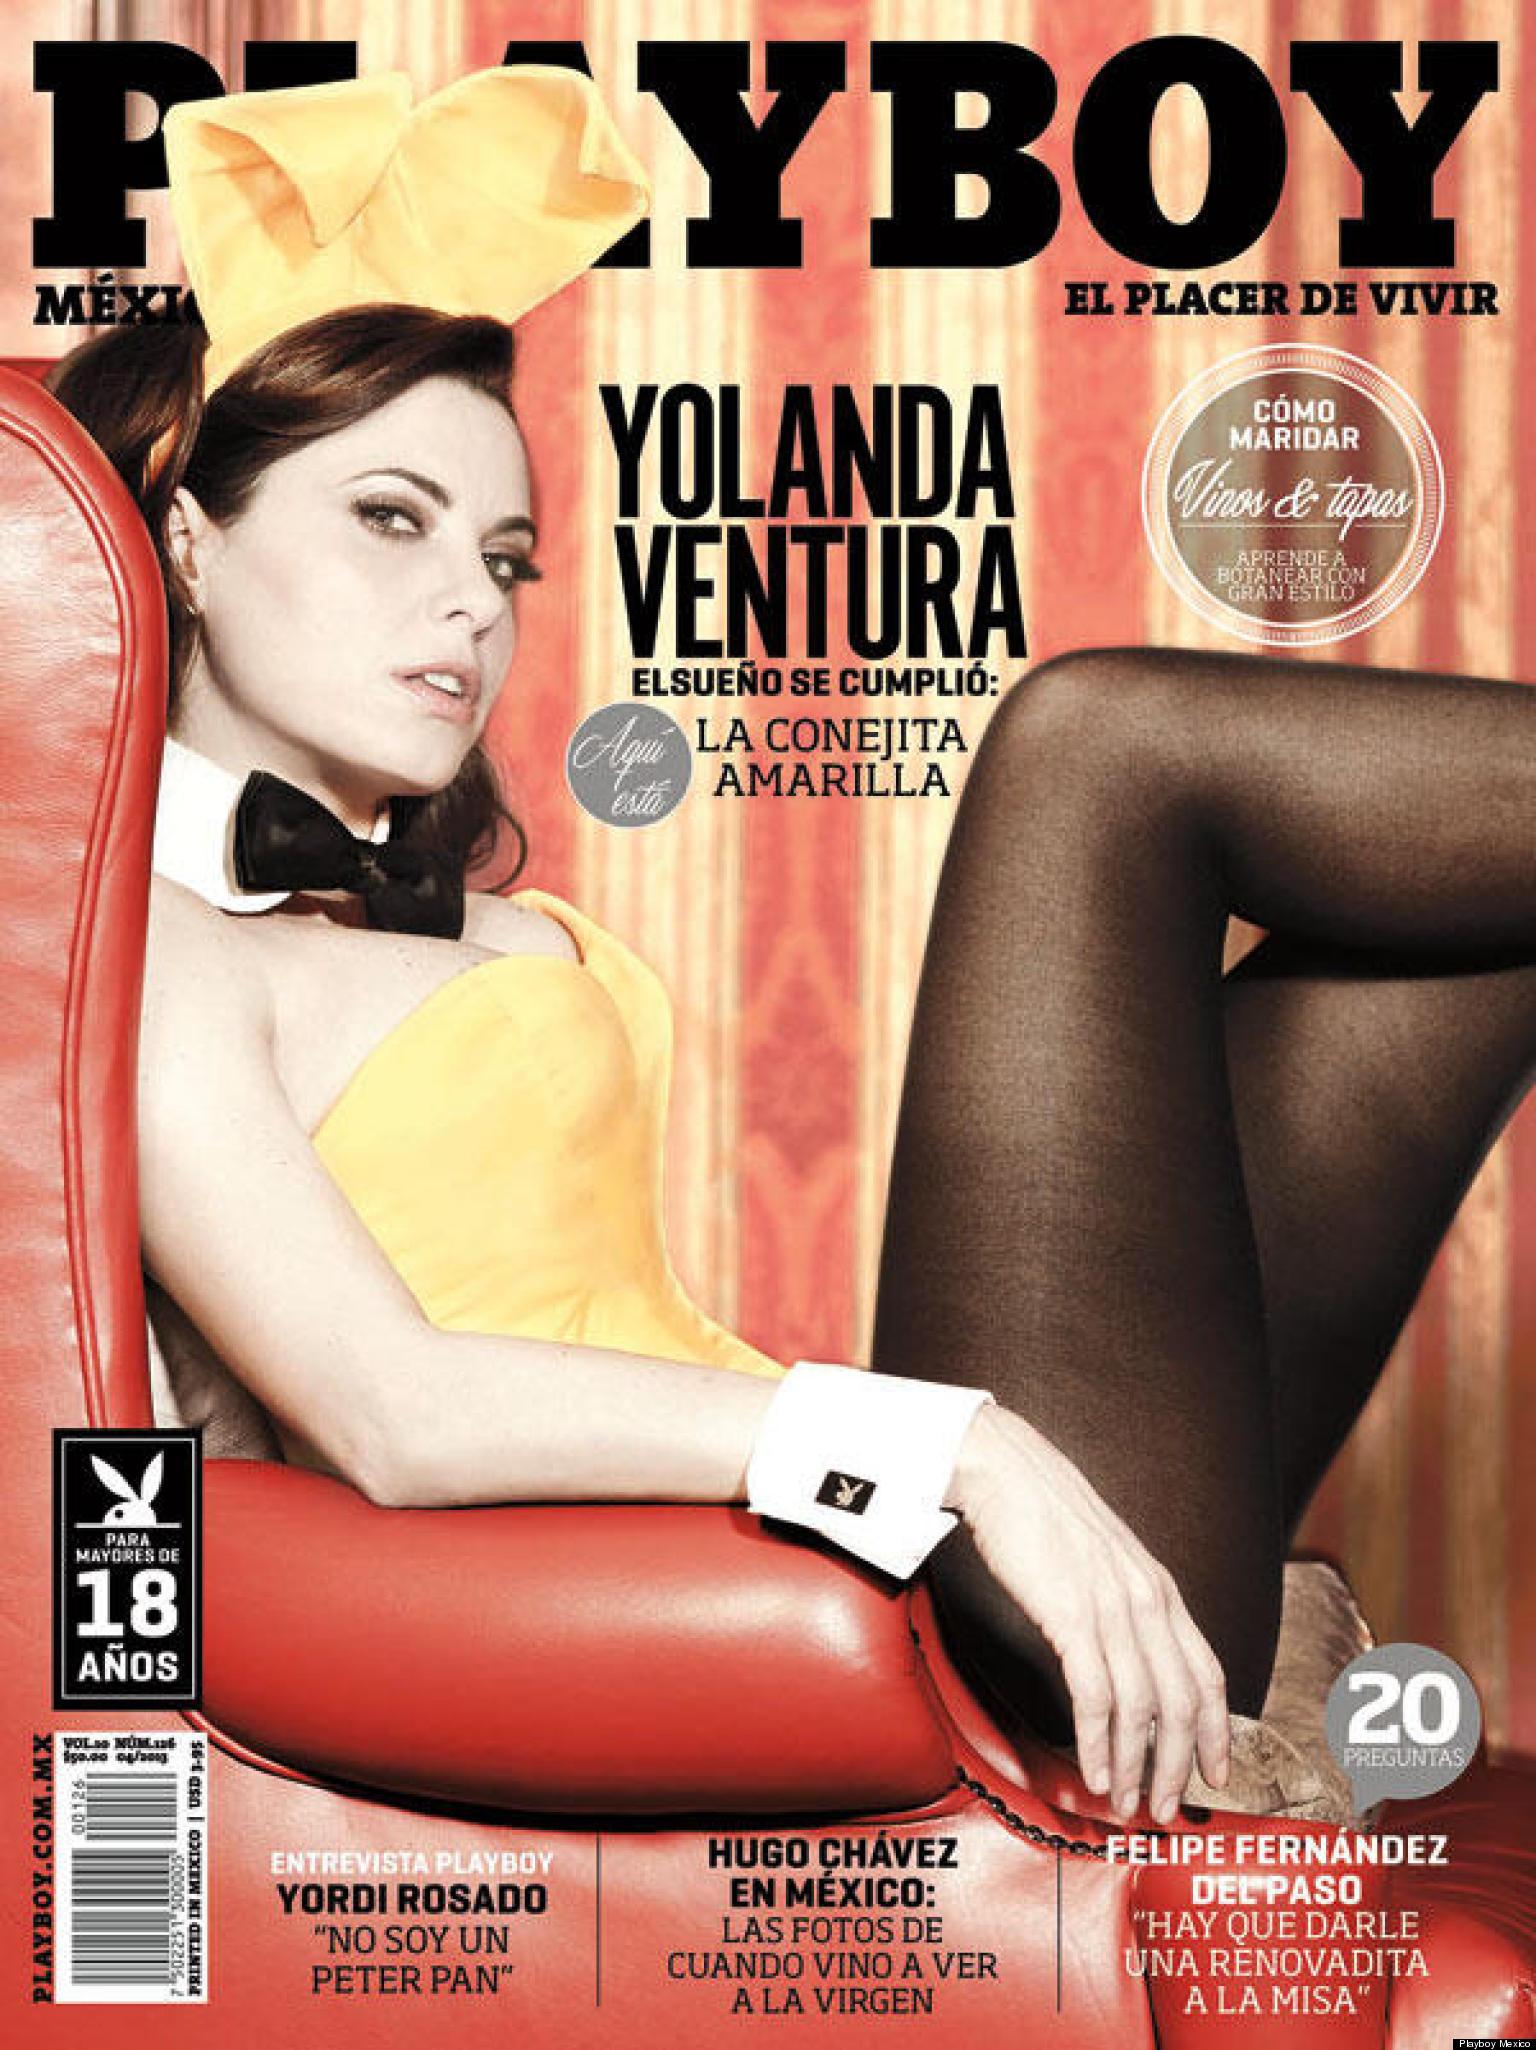 YOLANDA-VENTURA-PLAYBOY2-facebook.jpg